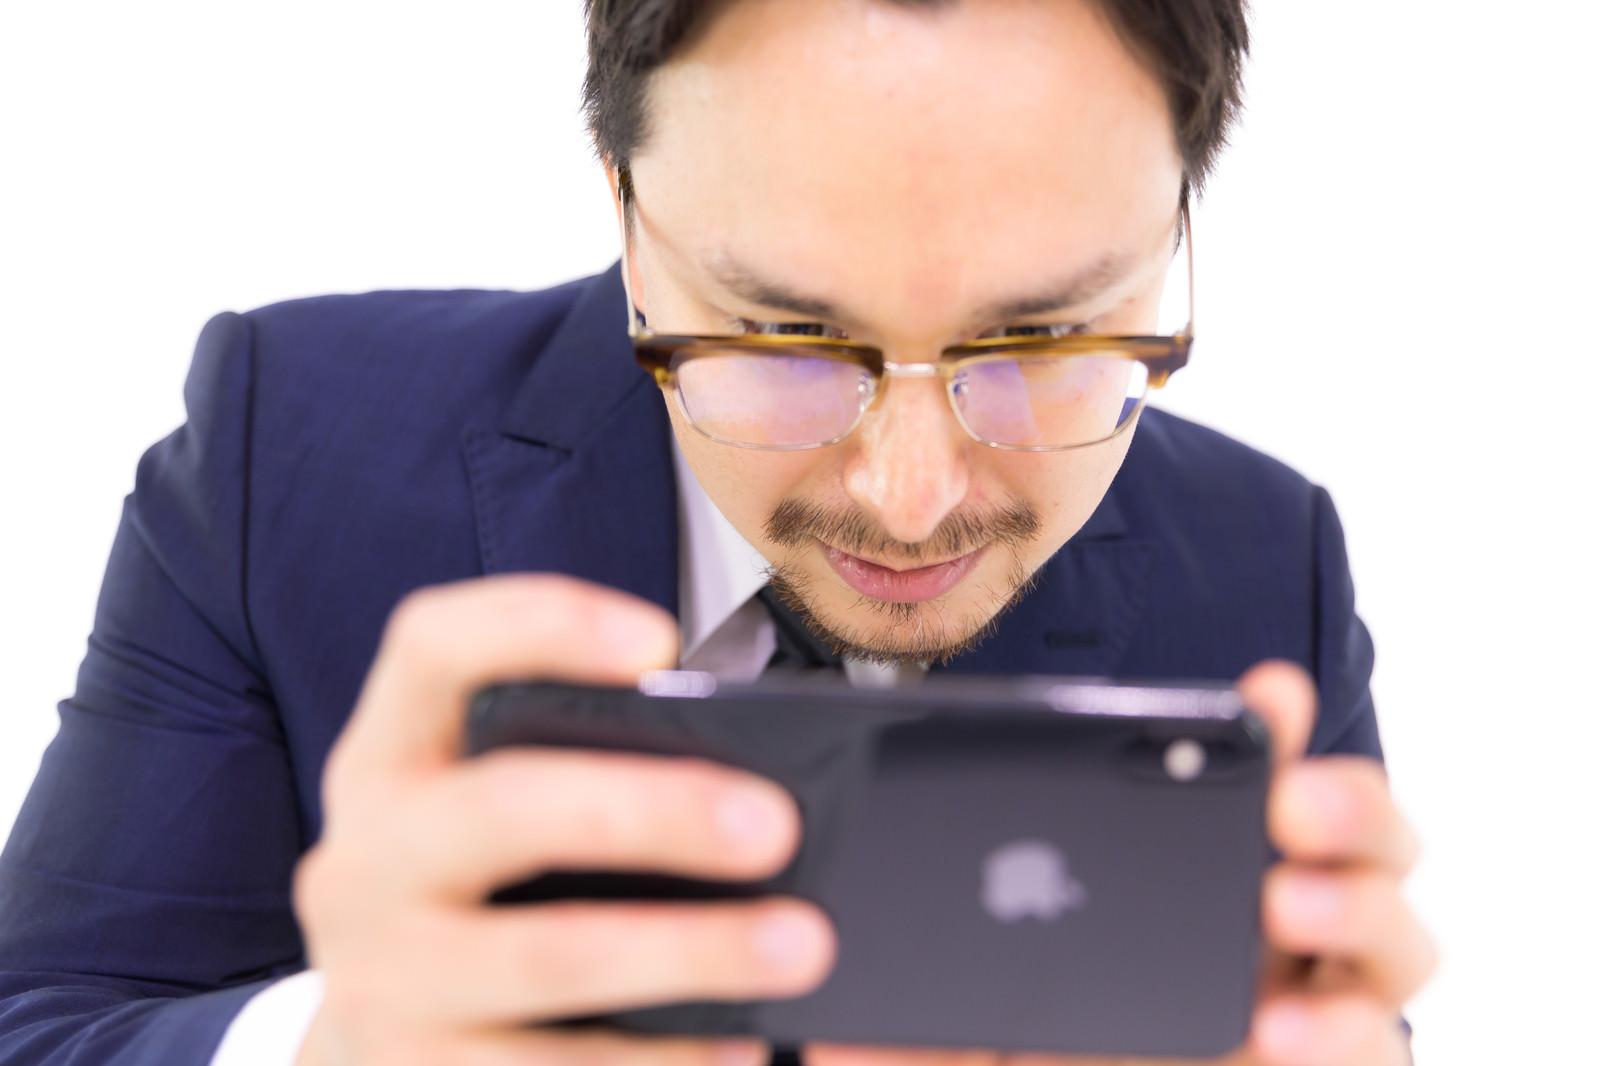 「iPhone XS Max で動画を見るビジネスマン」の写真[モデル:Max_Ezaki]